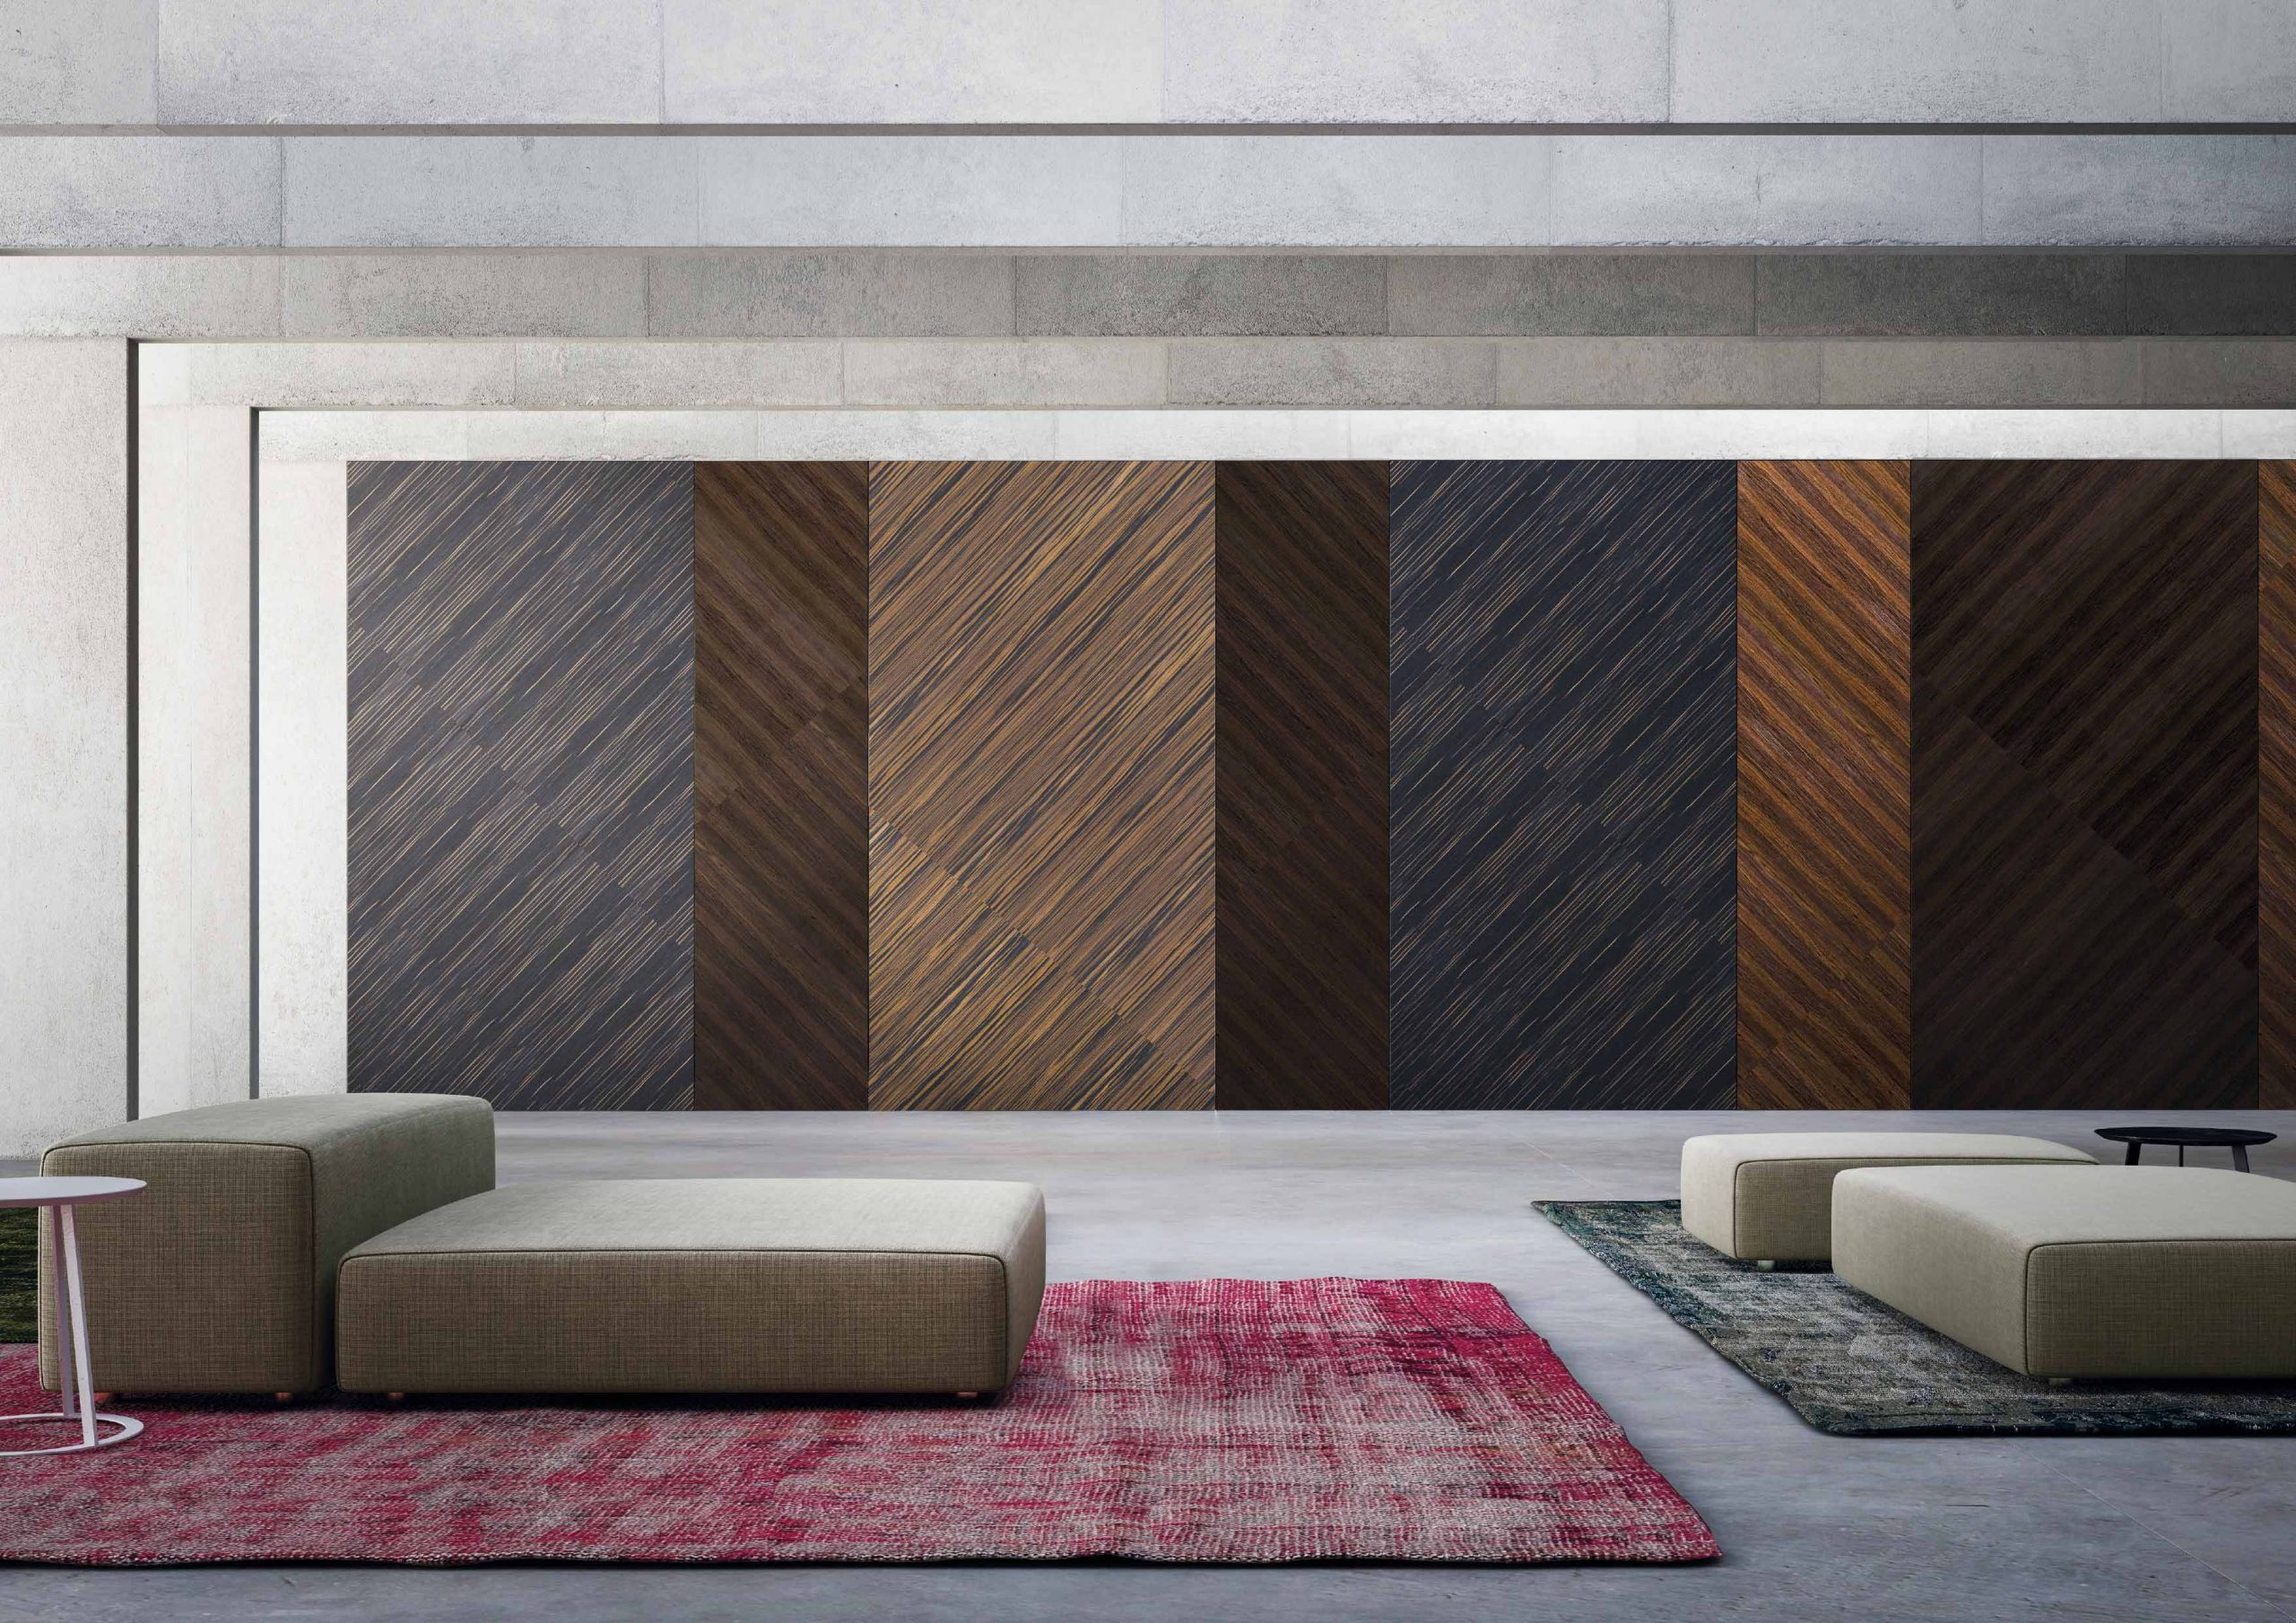 colorful-pivoting-wall-in-resort-2-fritsjurgens-pivot-hinges-inside-scaled.jpg